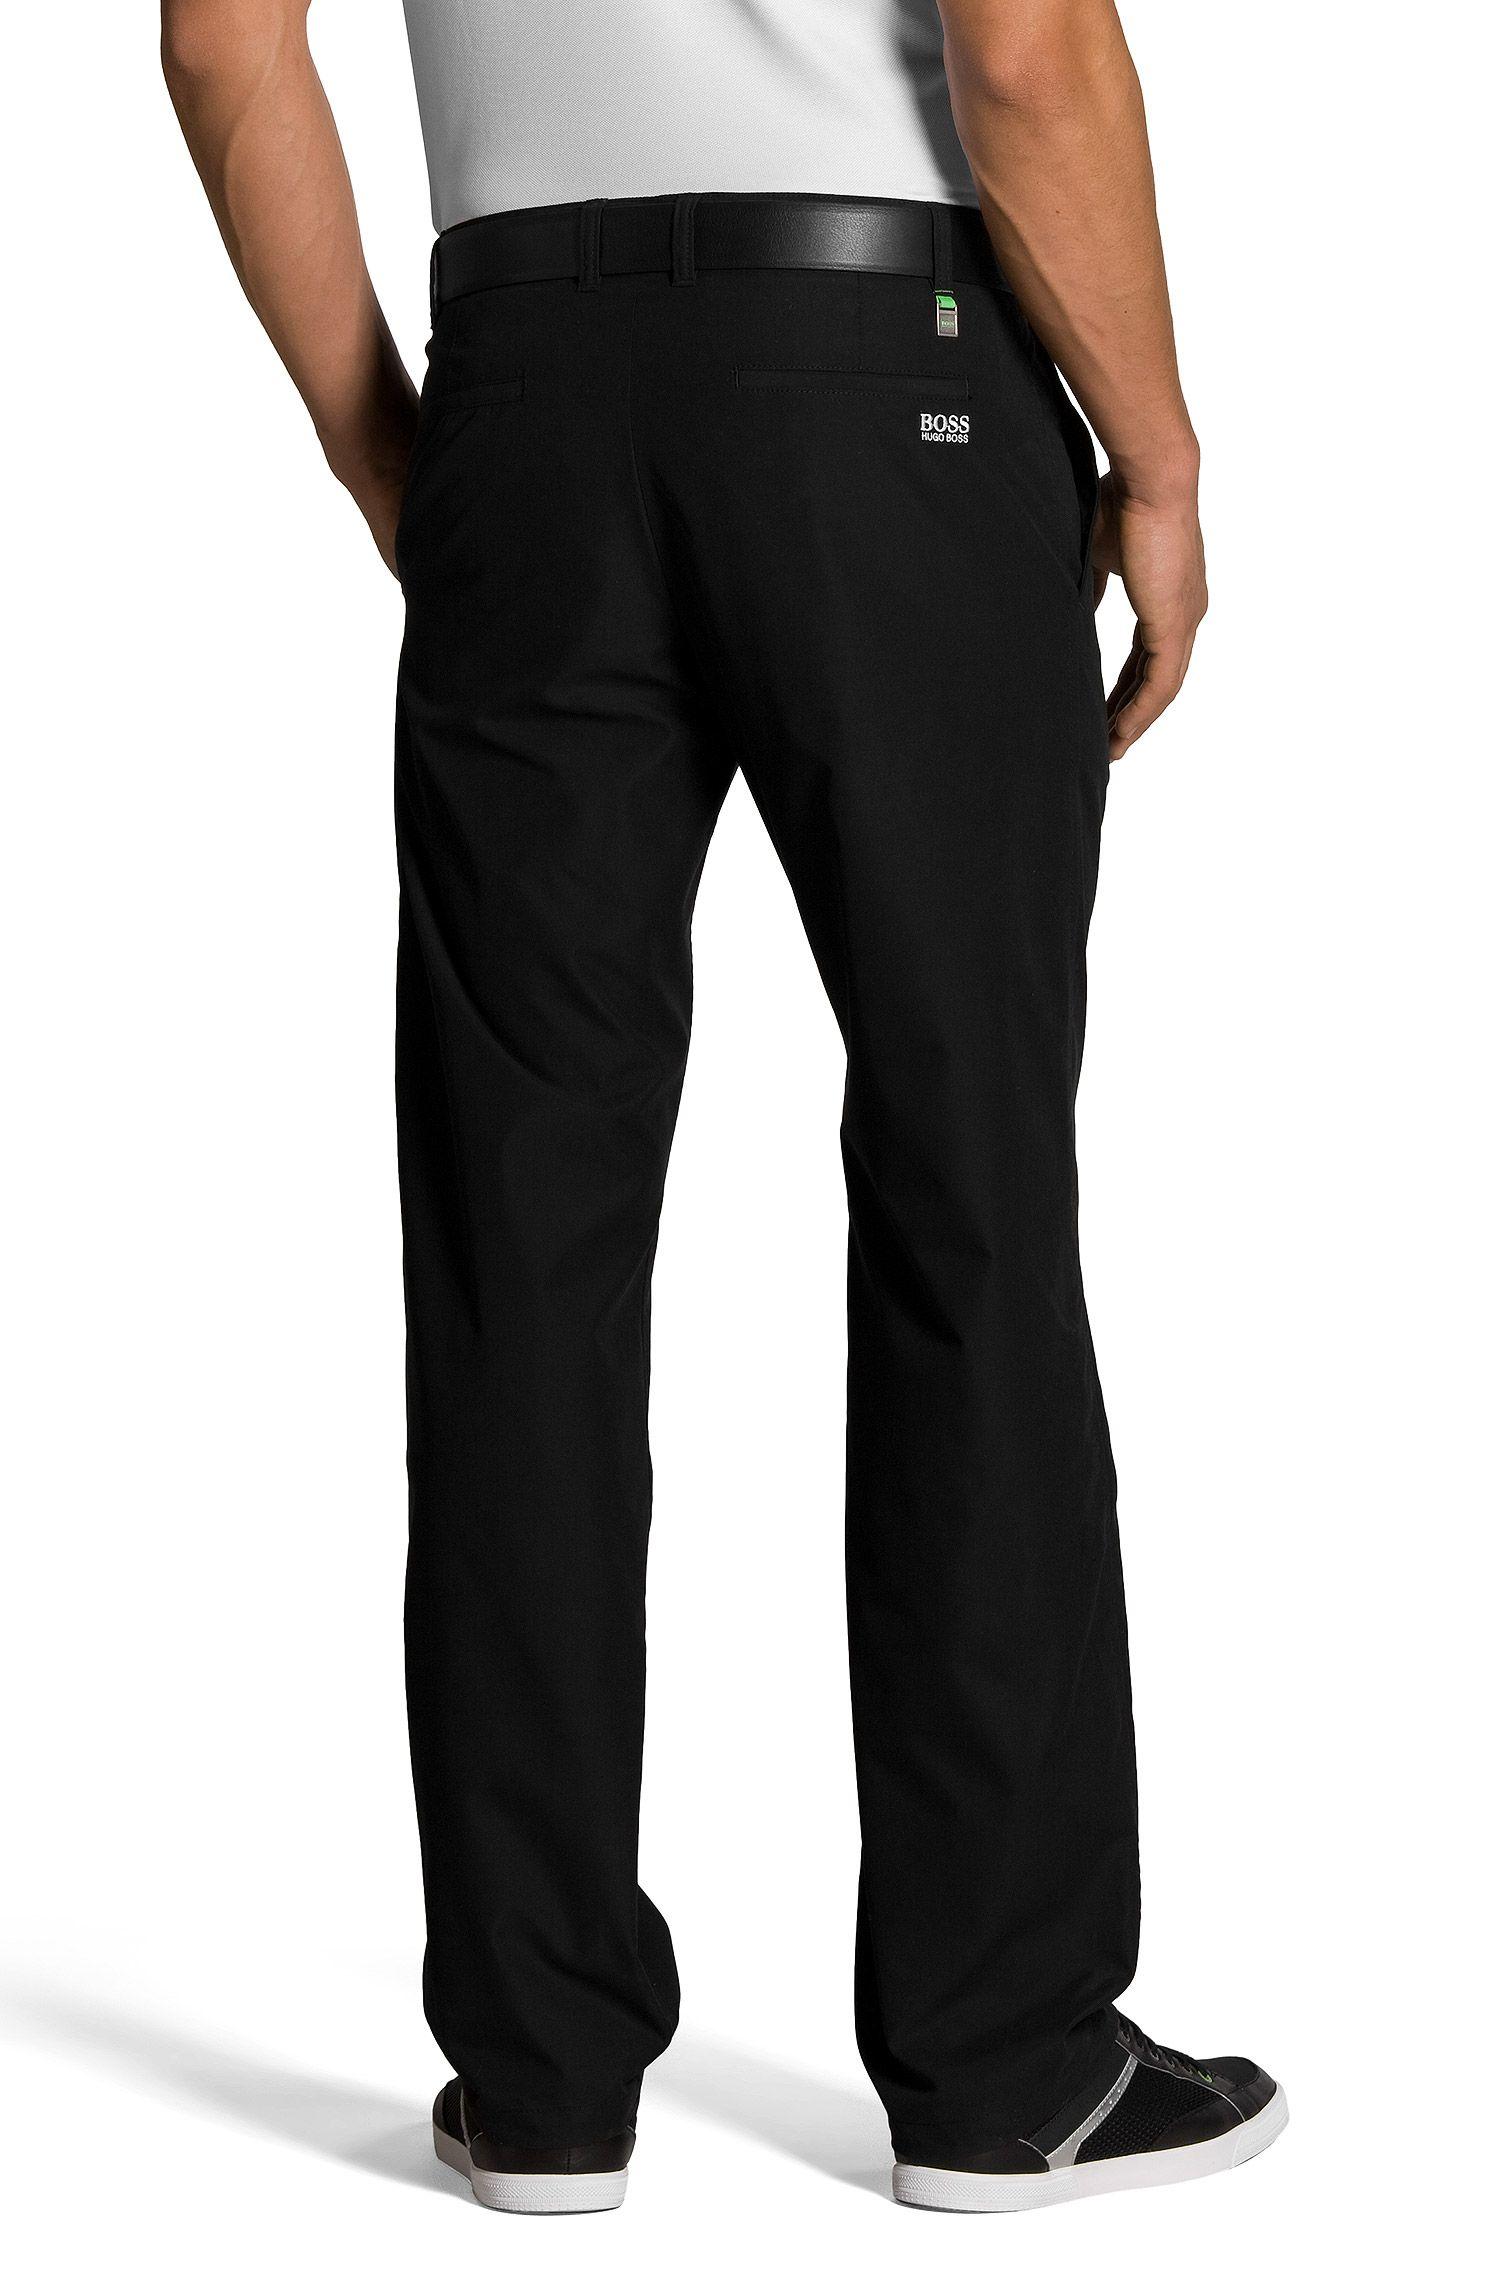 Pantalon de golf pro Regular Fit, Haddys Pro 1